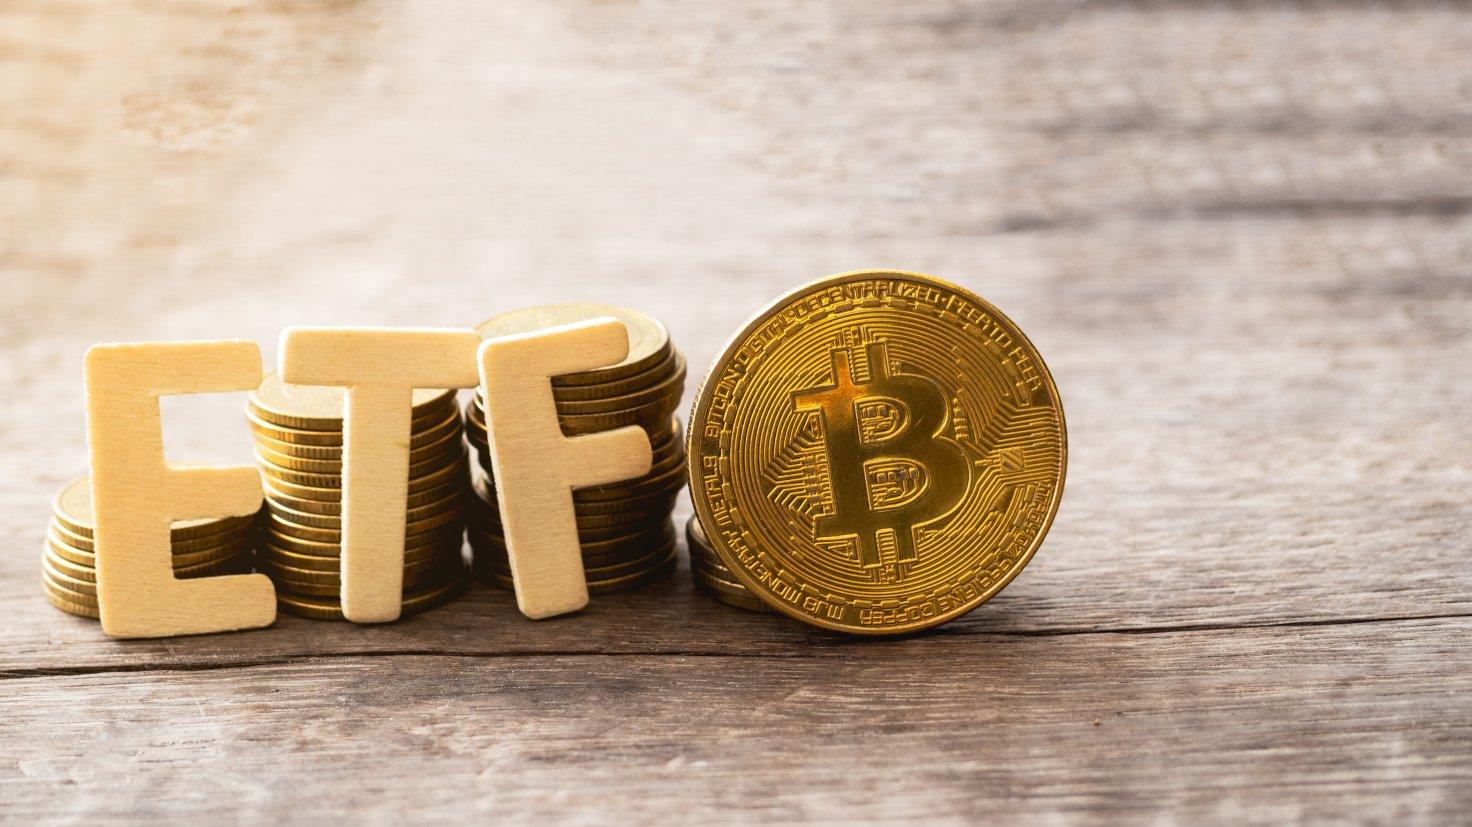 SEC tiếp tục trì hoãn quỹ Bitcoin ETF của VanEck